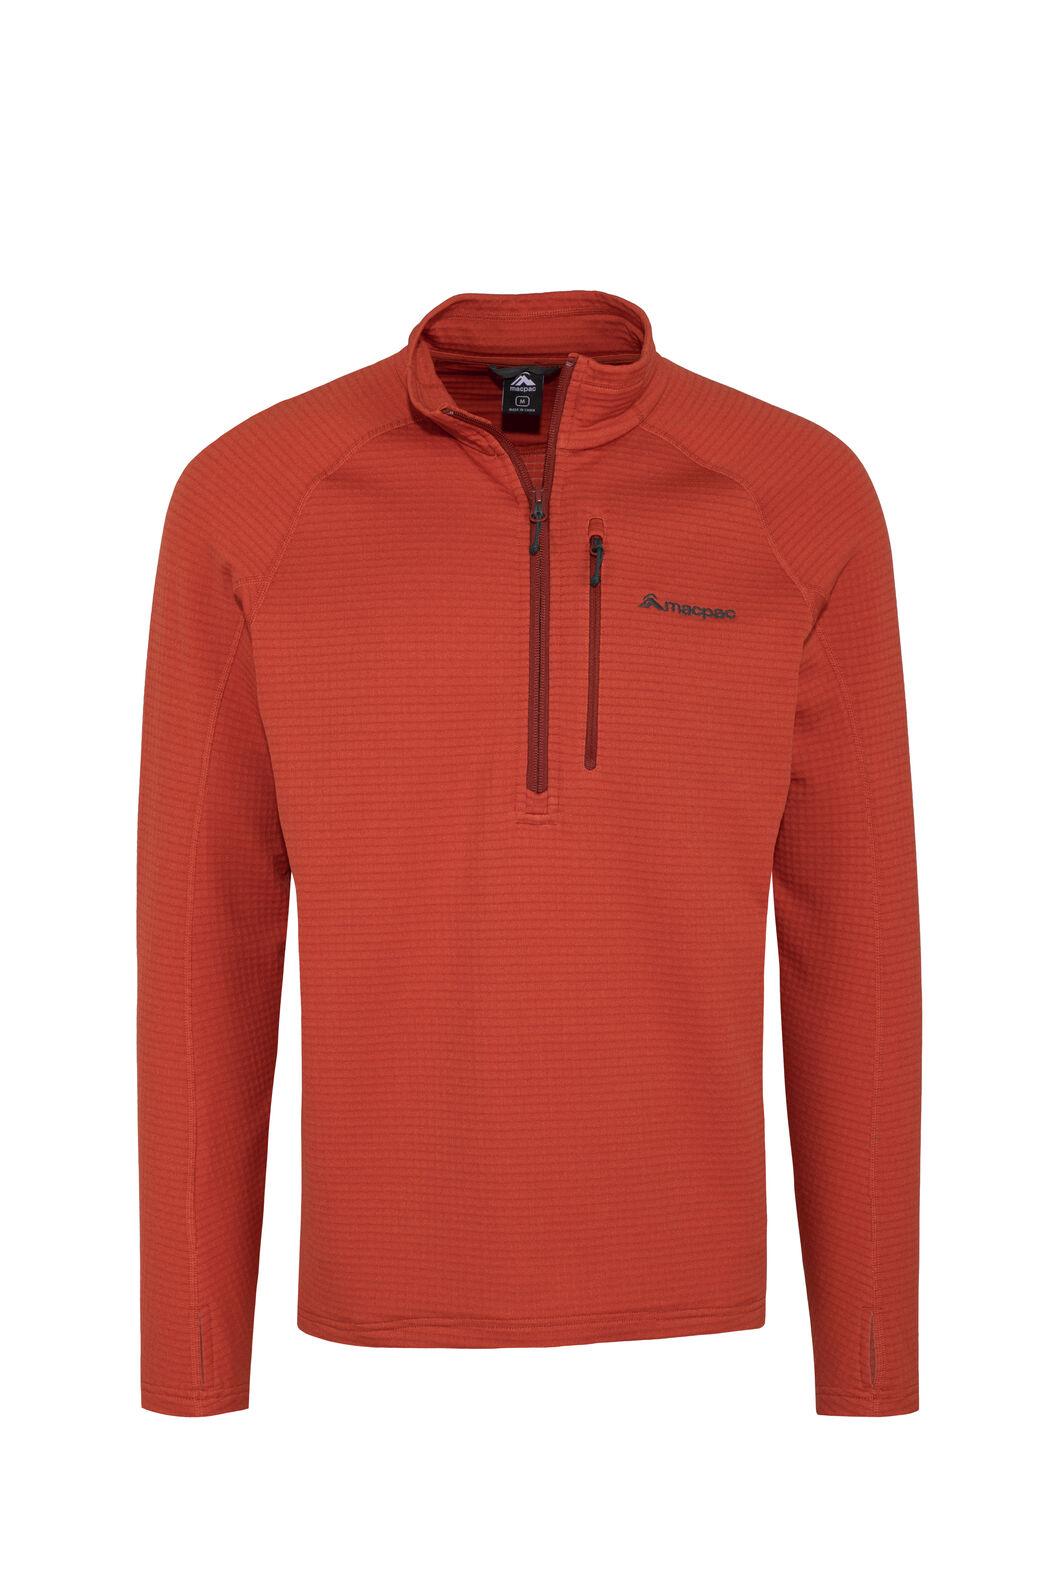 Macpac Ion Polartec® Fleece Half Zip Pullover — Men's, Rooibos Tea, hi-res